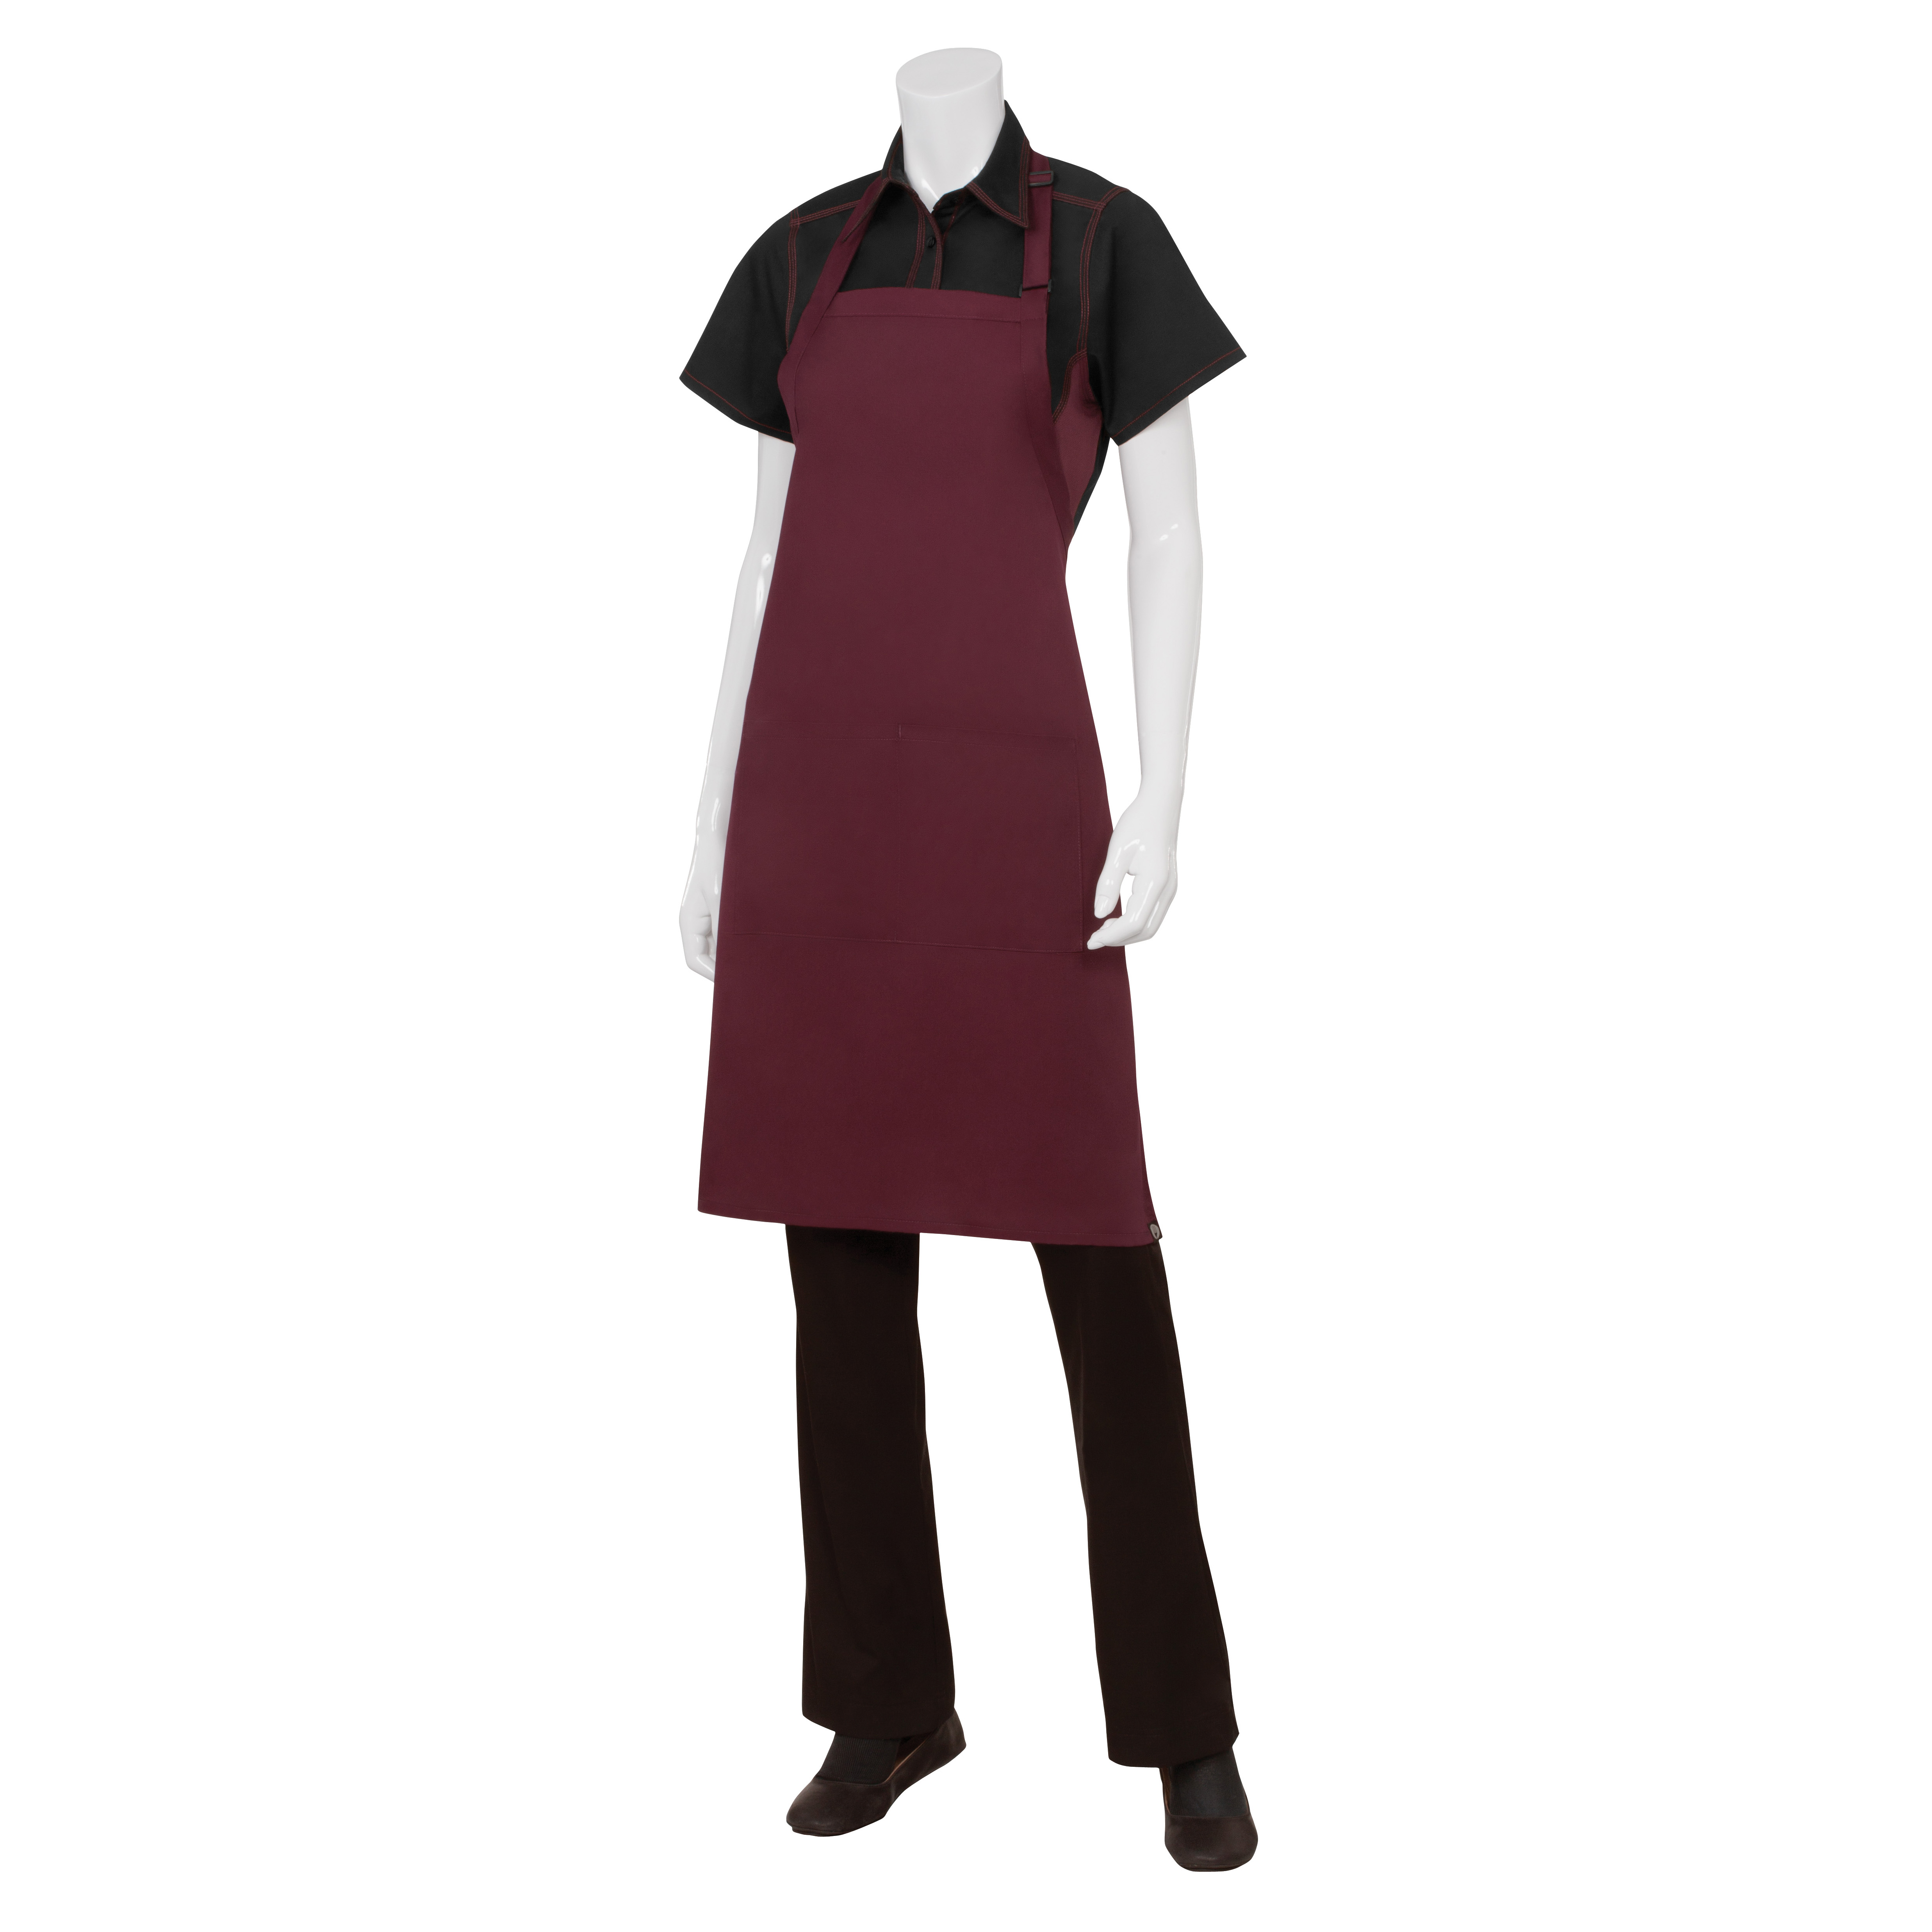 Chef Works F8 MER0 bib apron